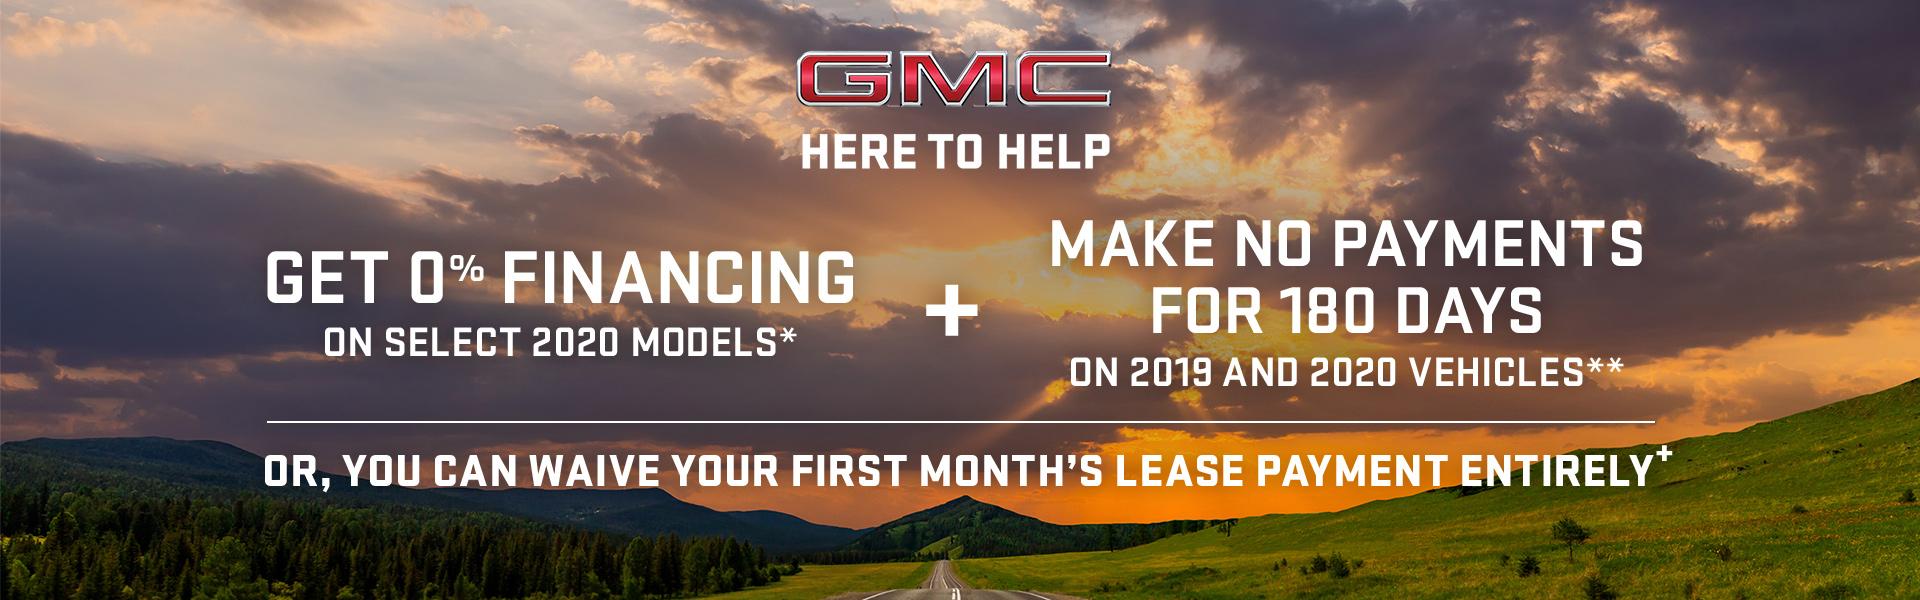 GMCCA - Western - GMC Cares